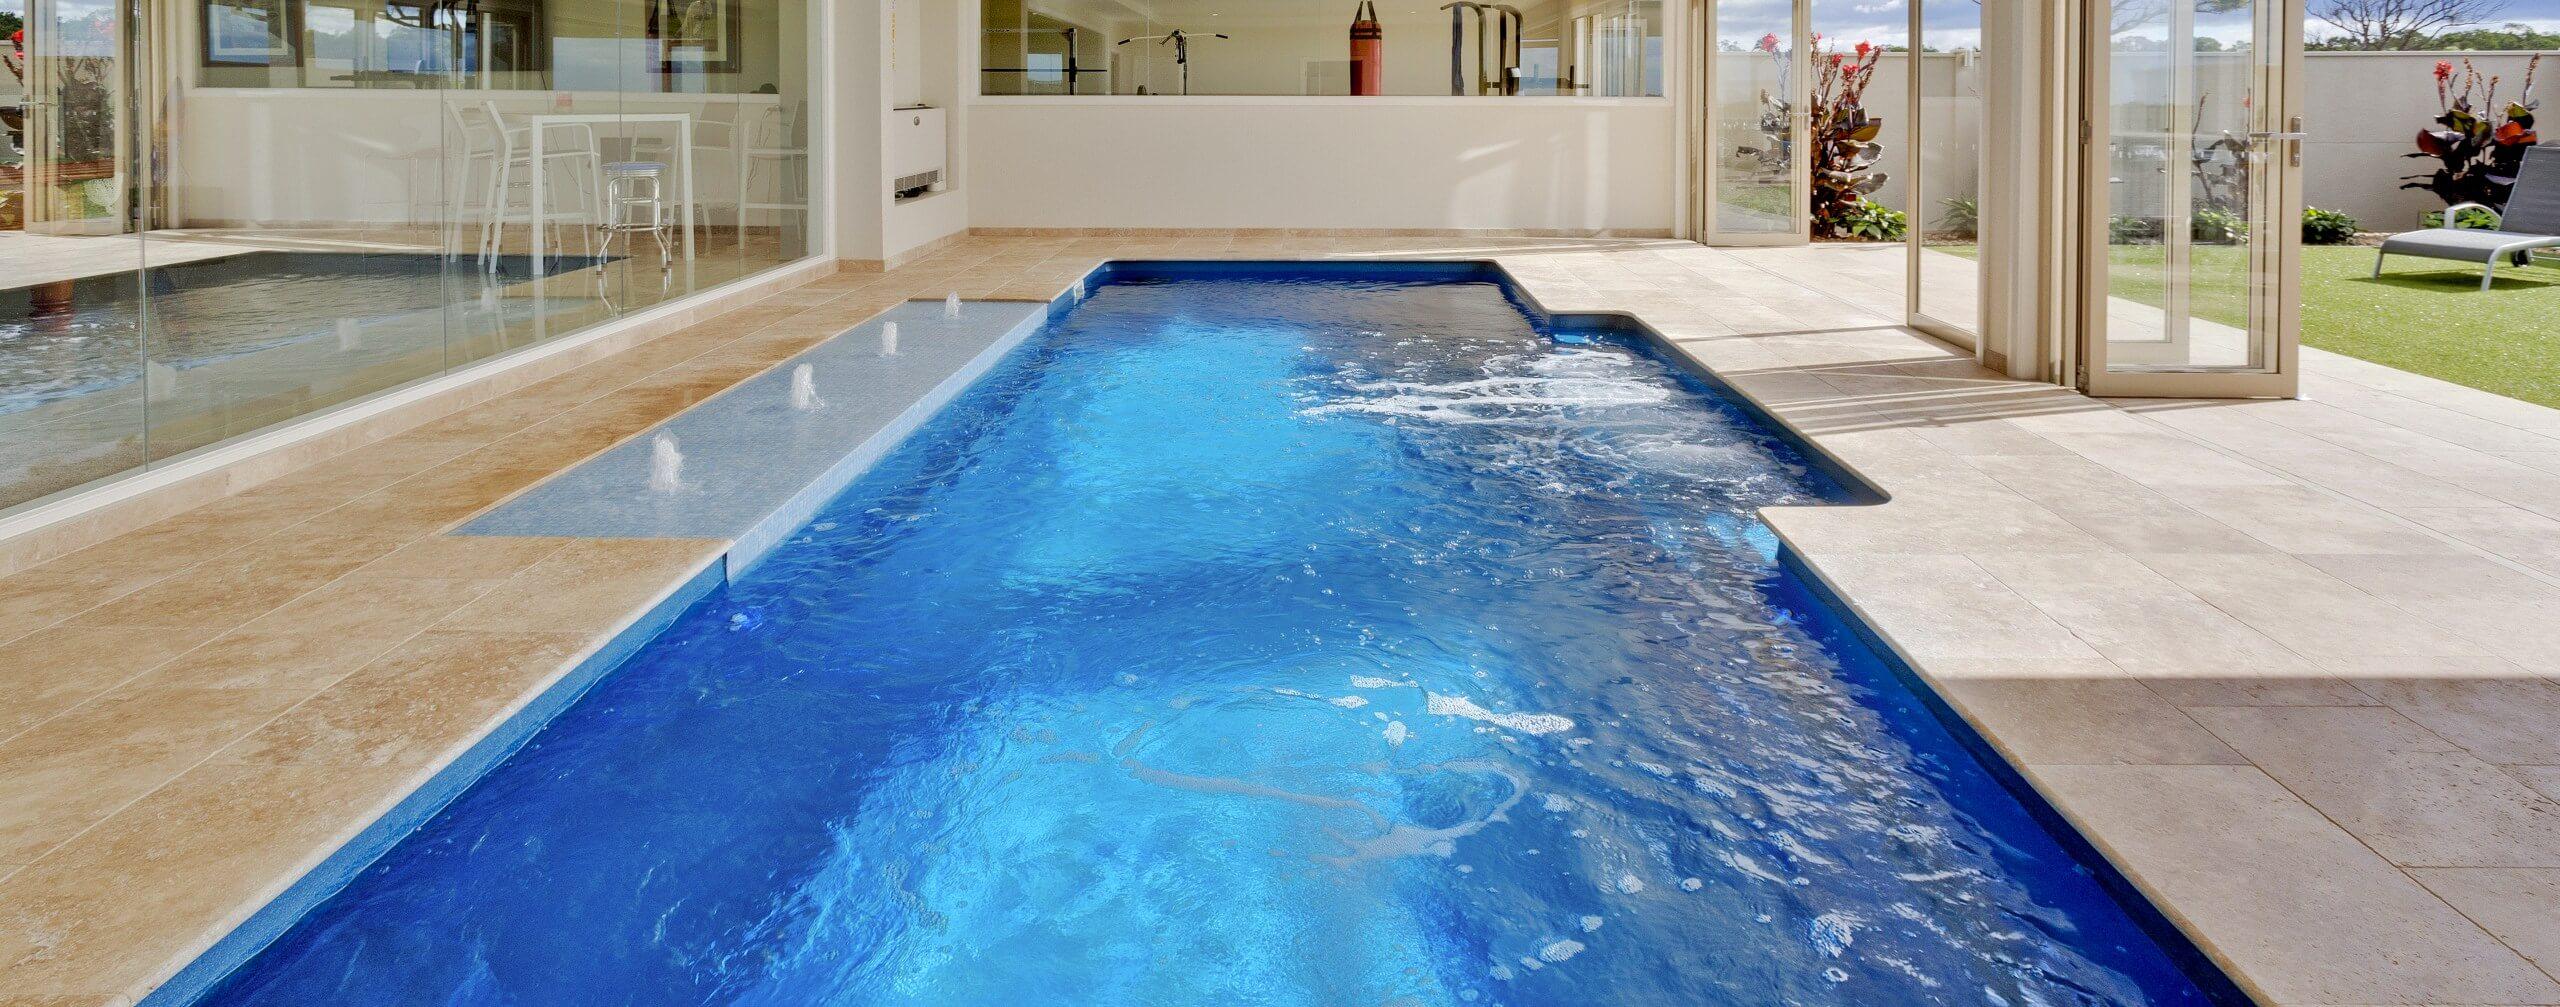 Compass Pools Australia Vogue fibreglass pool with bubblers and sunpod